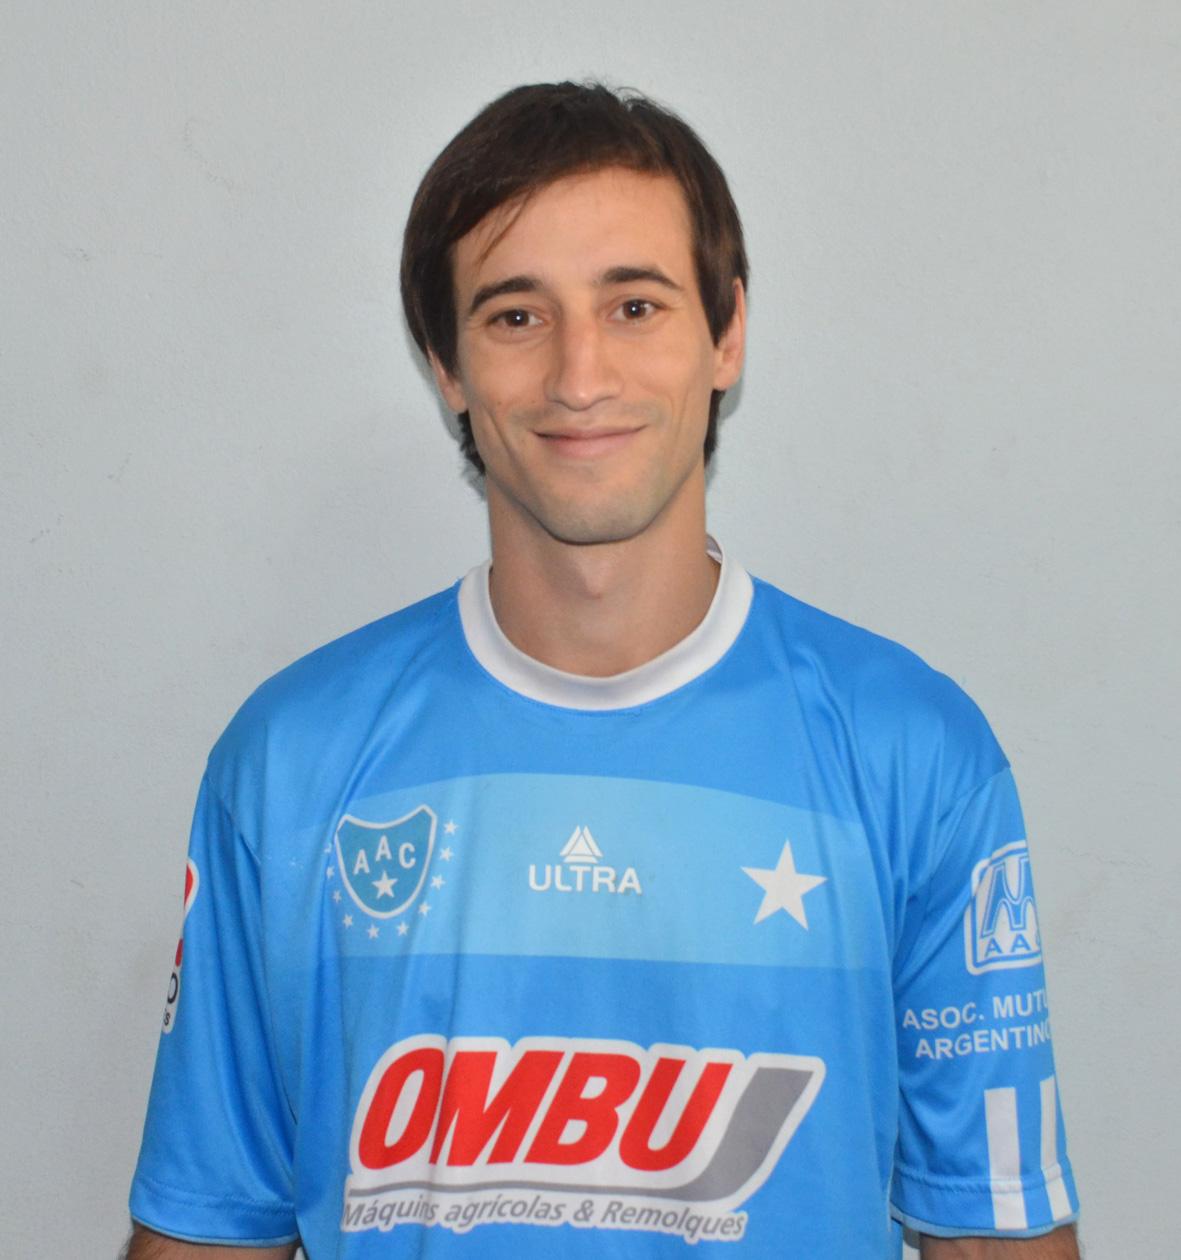 Ricardo Cravero - 6